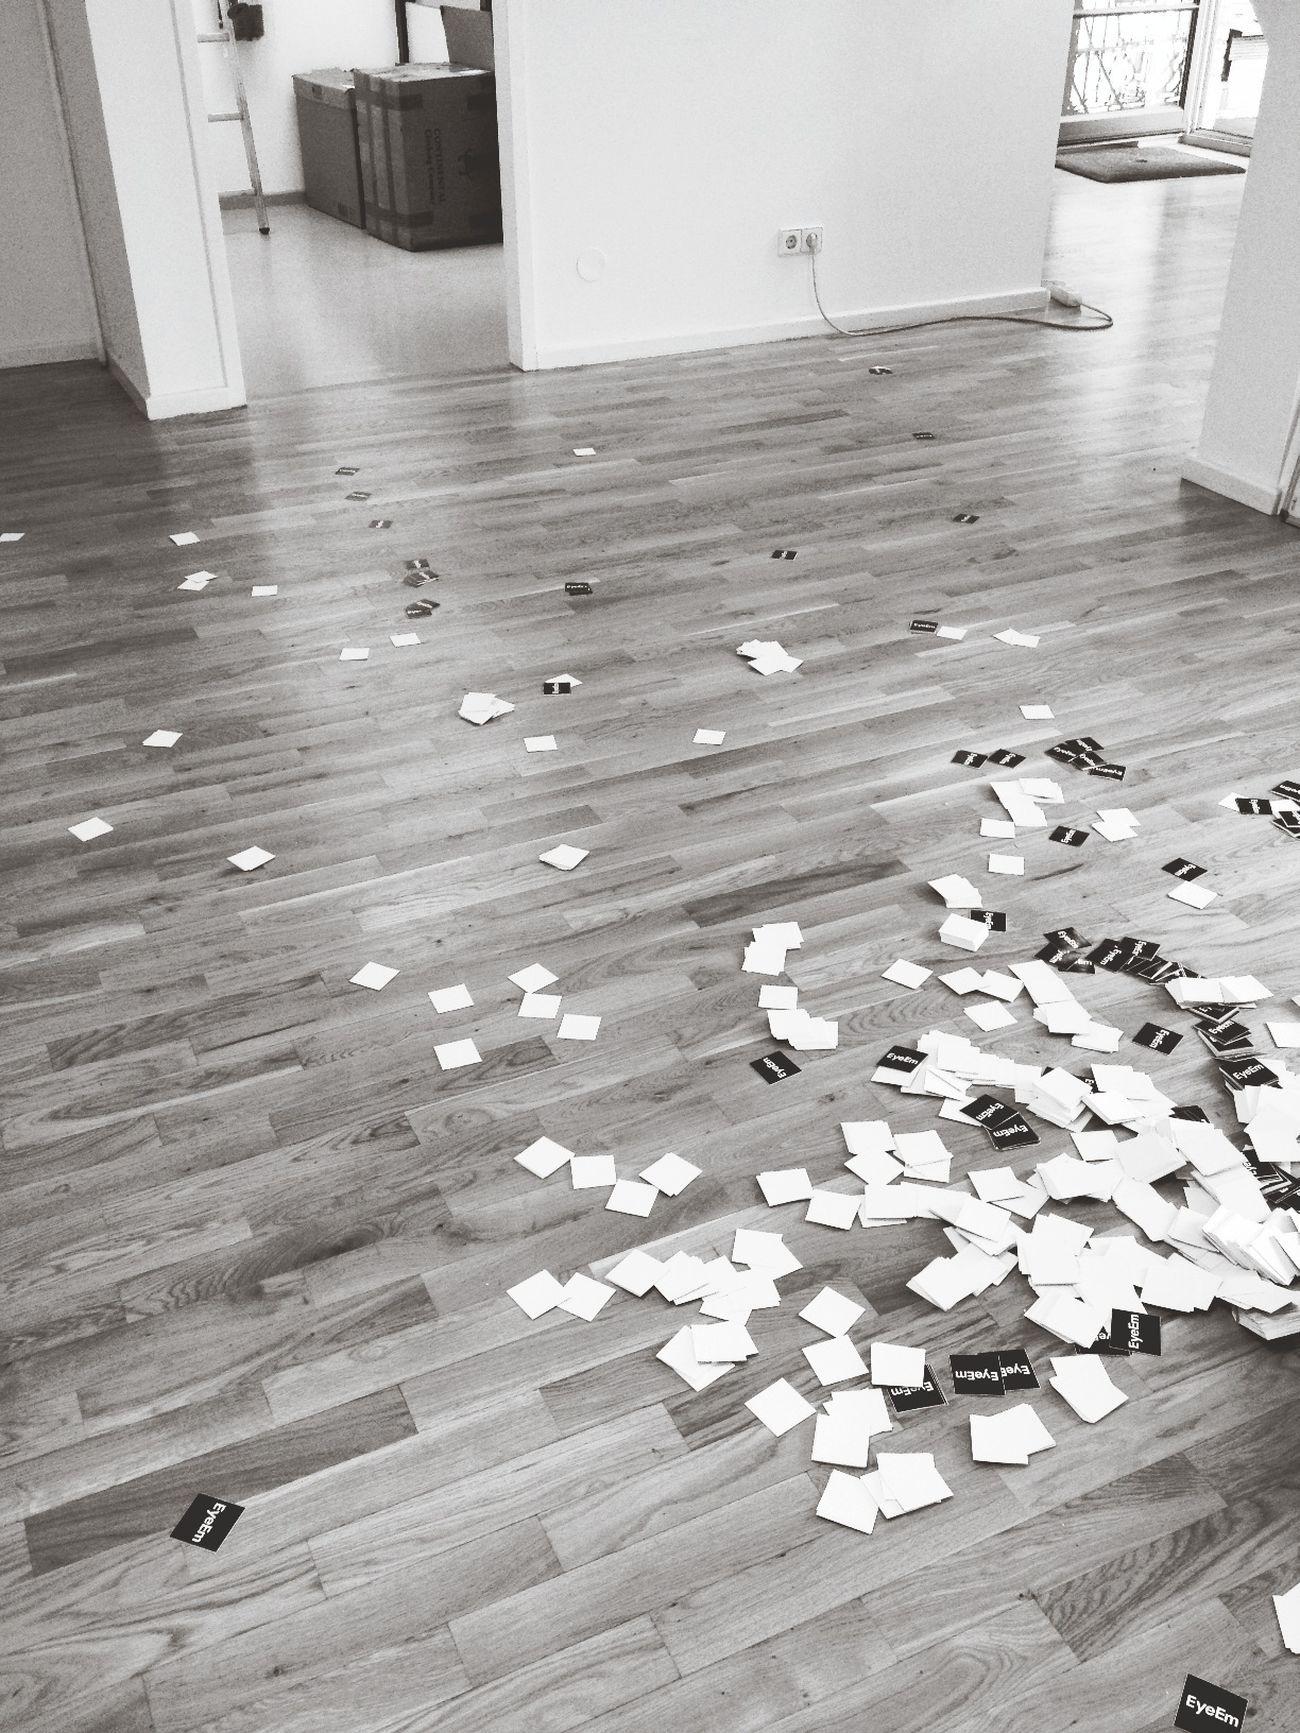 I dropped a whole box of stickers. FML